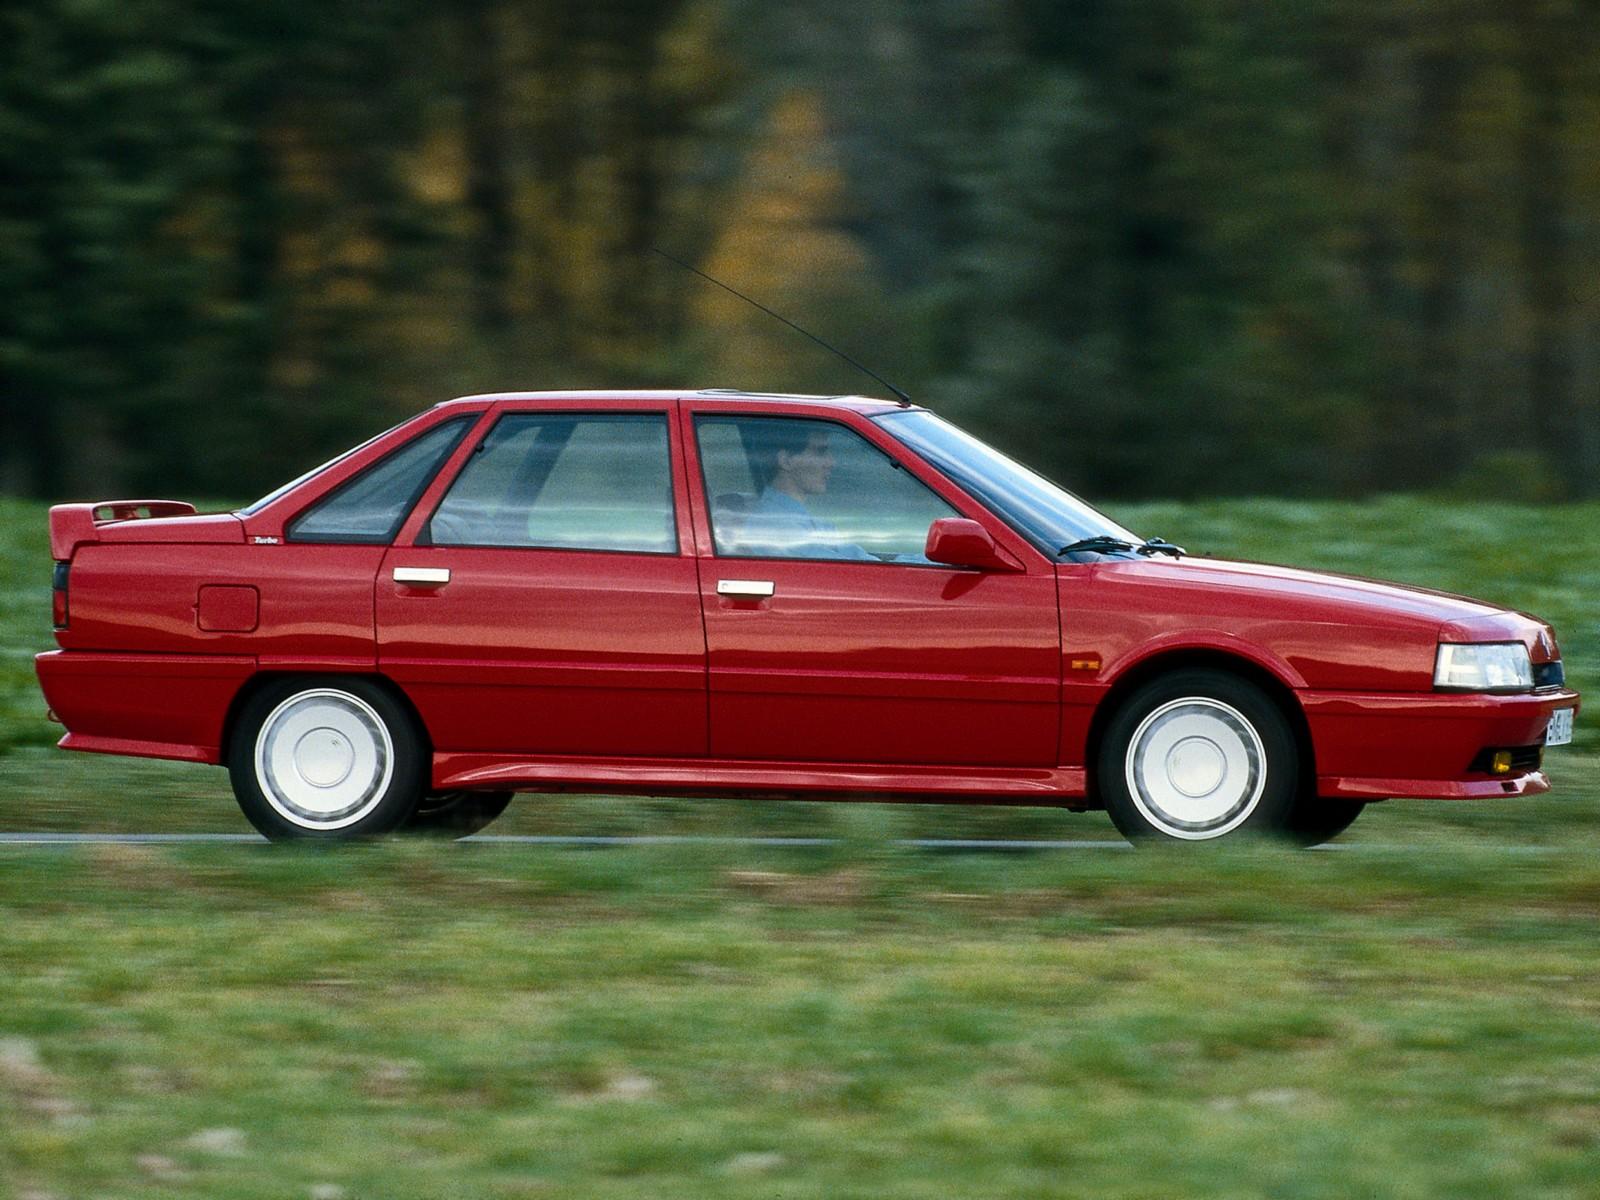 Renault 21 Sedan Specs Photos 1989 1990 1991 1992 1993 1994 Autoevolution